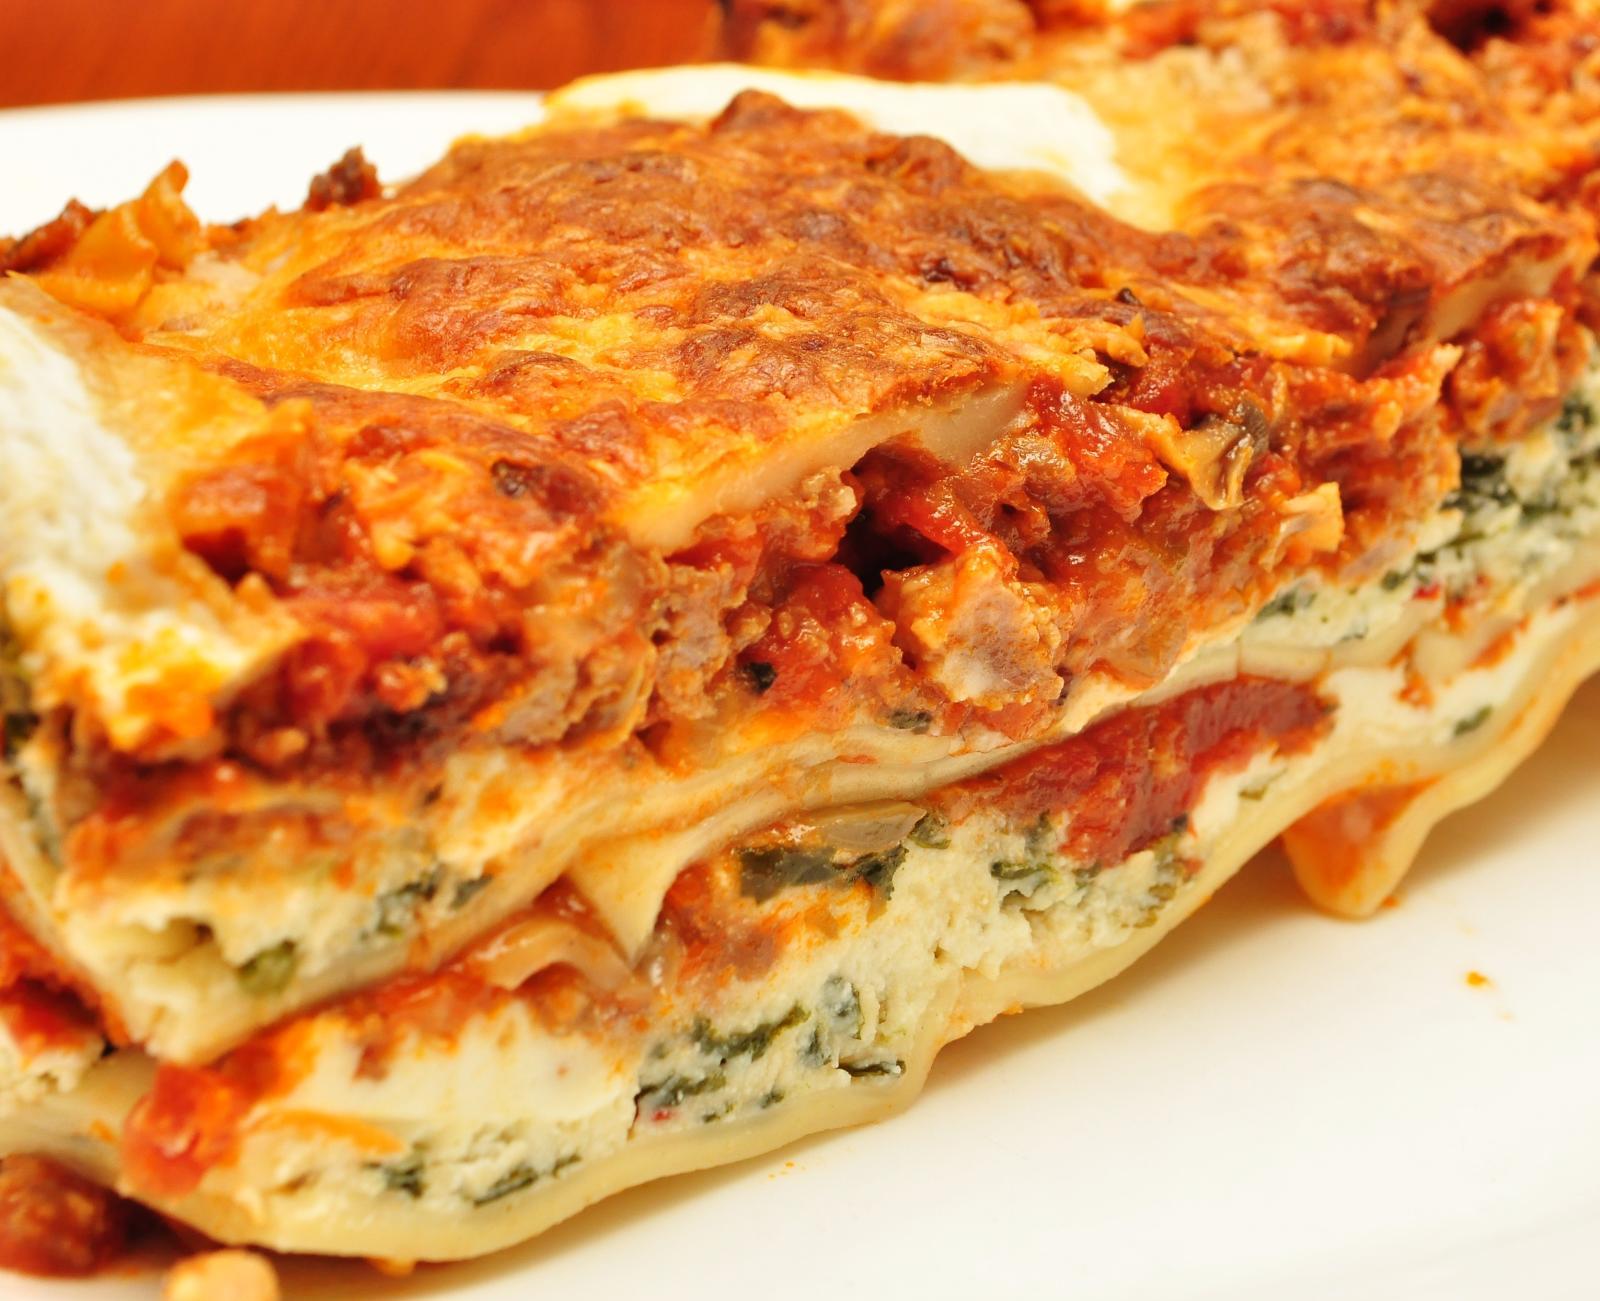 File:Lasagna (1).jpg - Wikimedia Commons